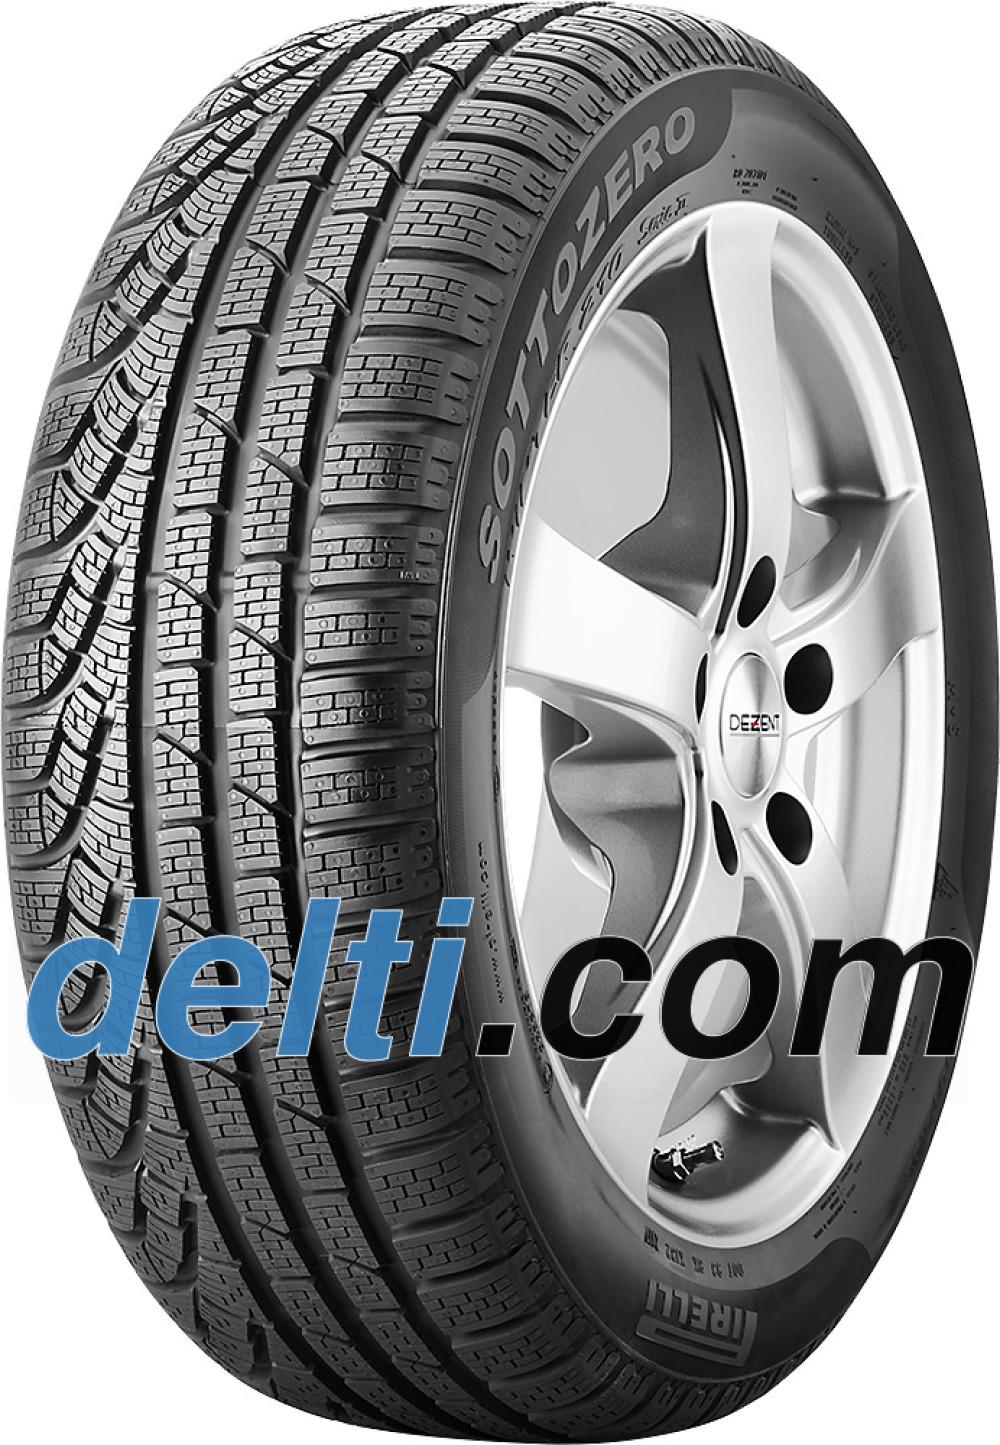 Pirelli W 210 SottoZero S2 ( 215/60 R17 96H , AO, med felgbeskyttelse (MFS) )